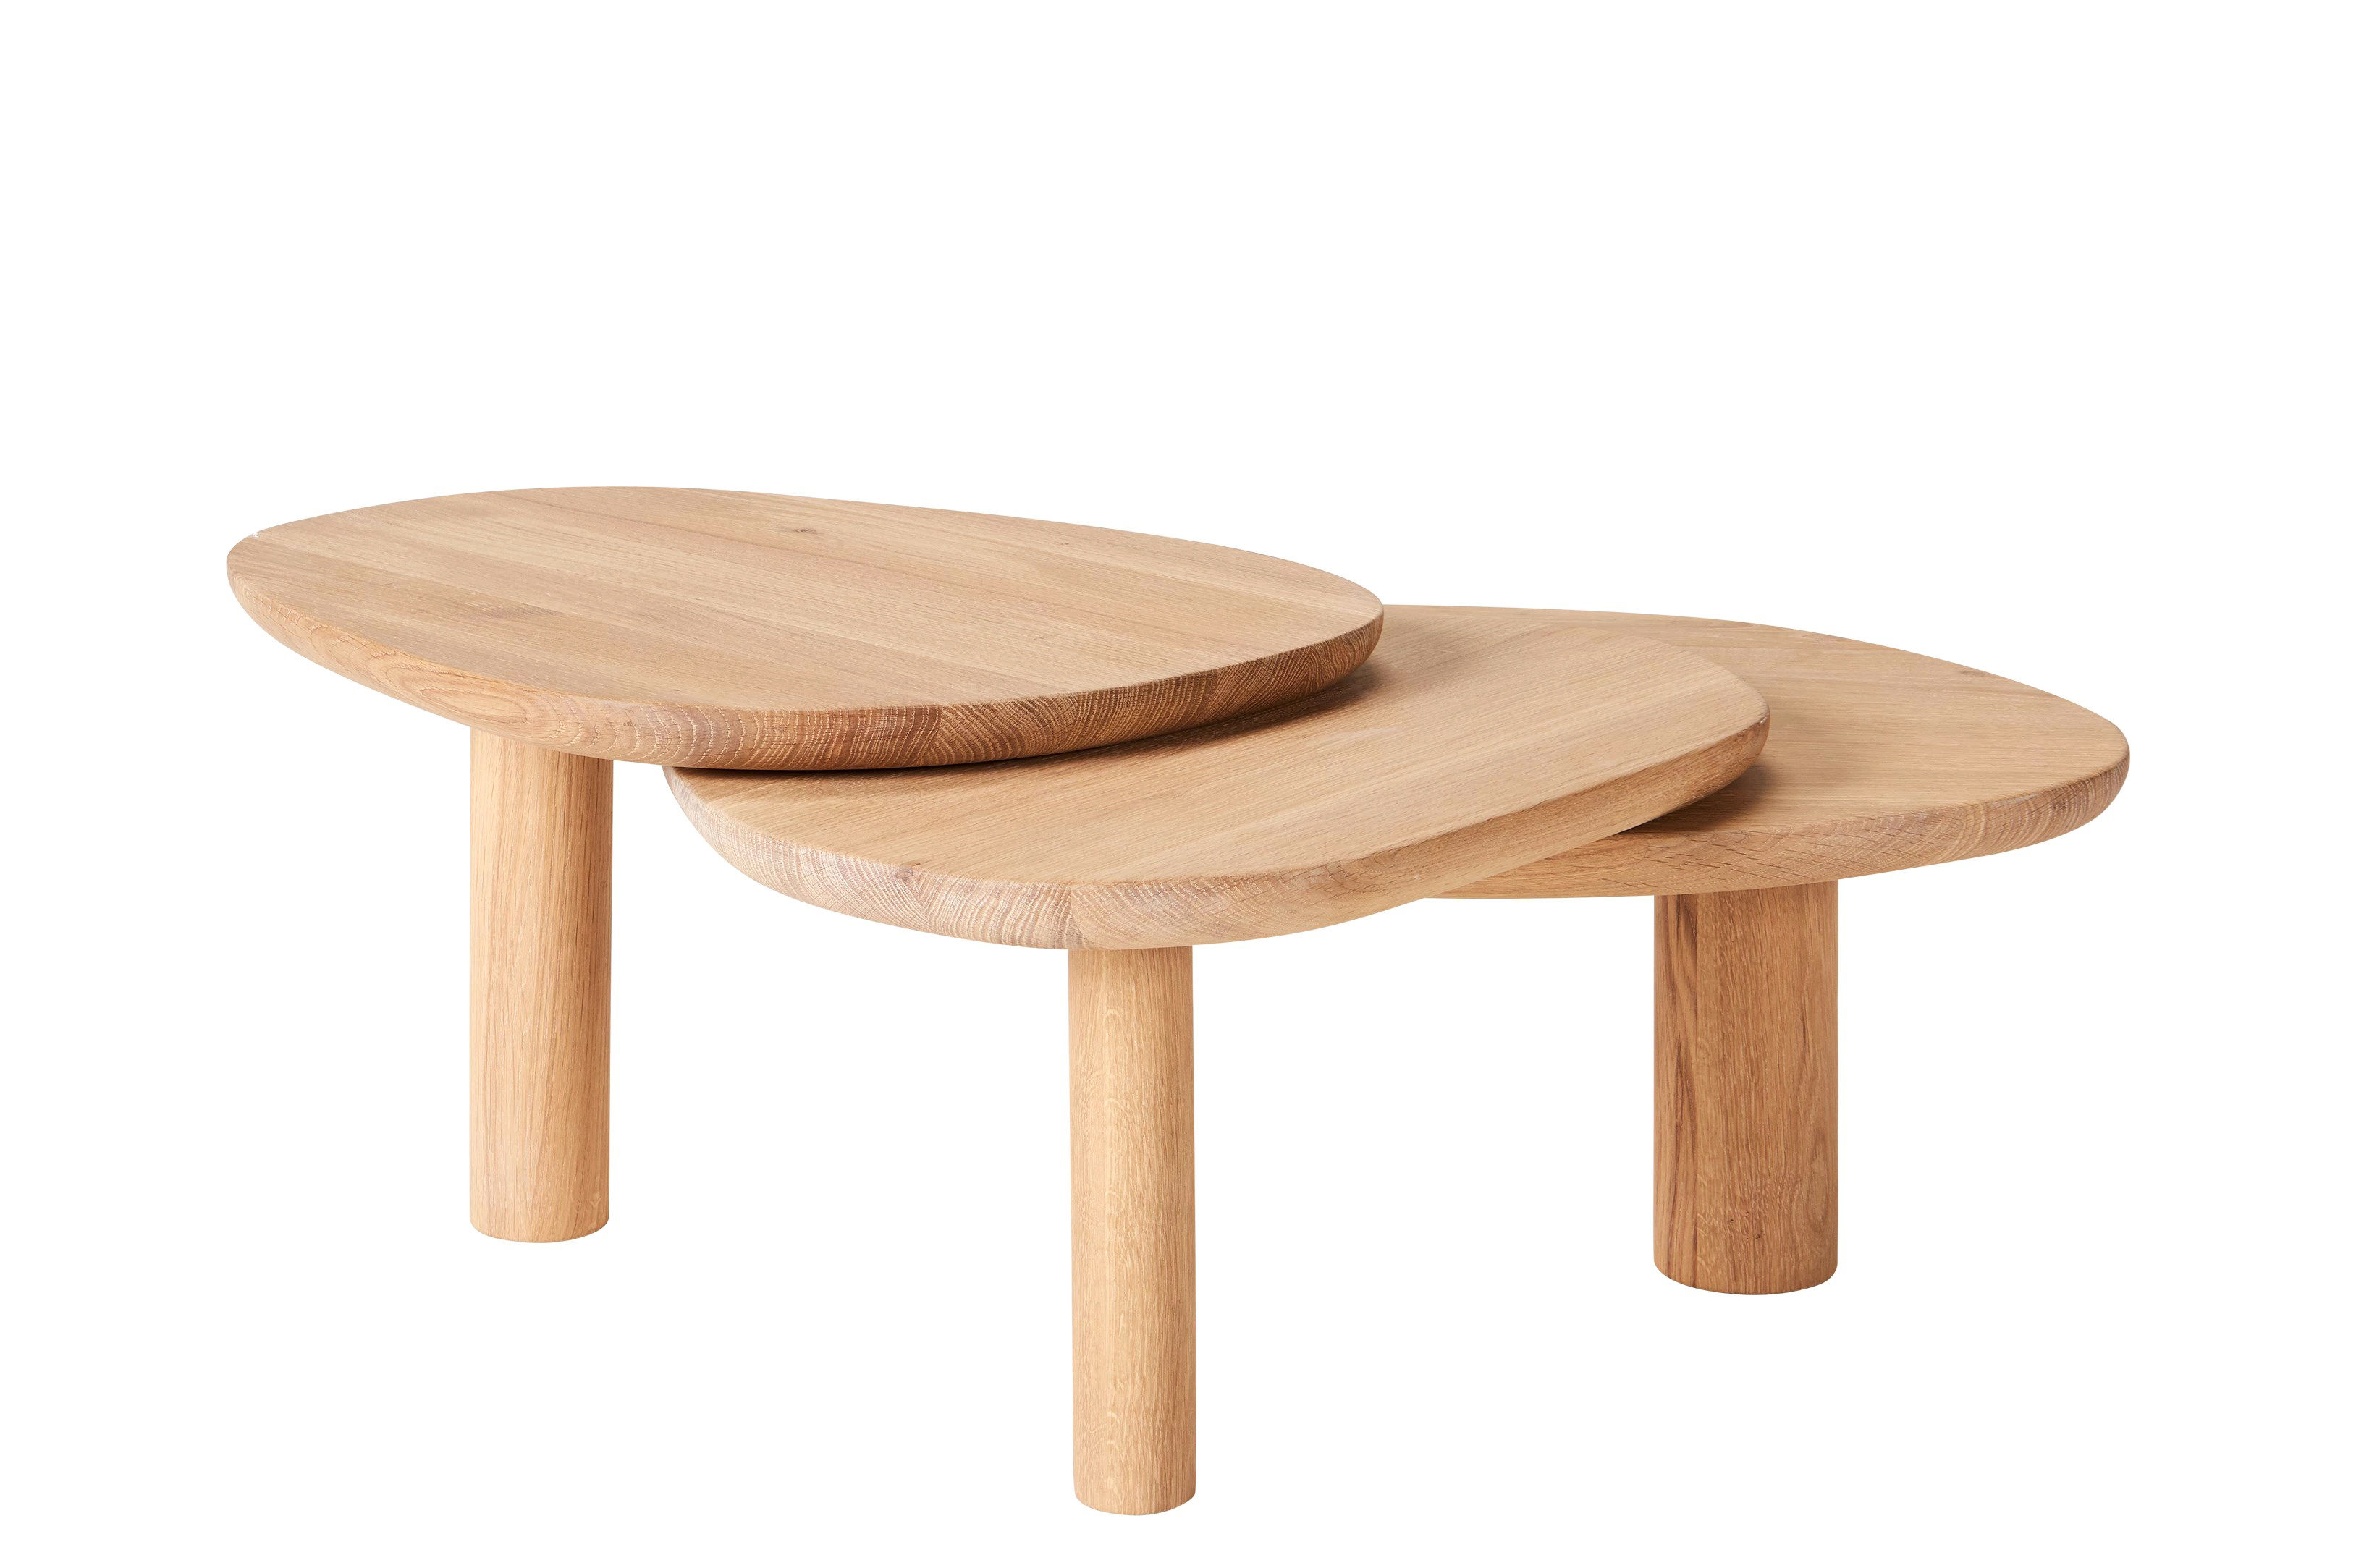 Mobilier - Tables basses - Table basse Latch / 100 x 80 cm - Chêne - Bolia - Chêne naturel - Chêne massif huilé